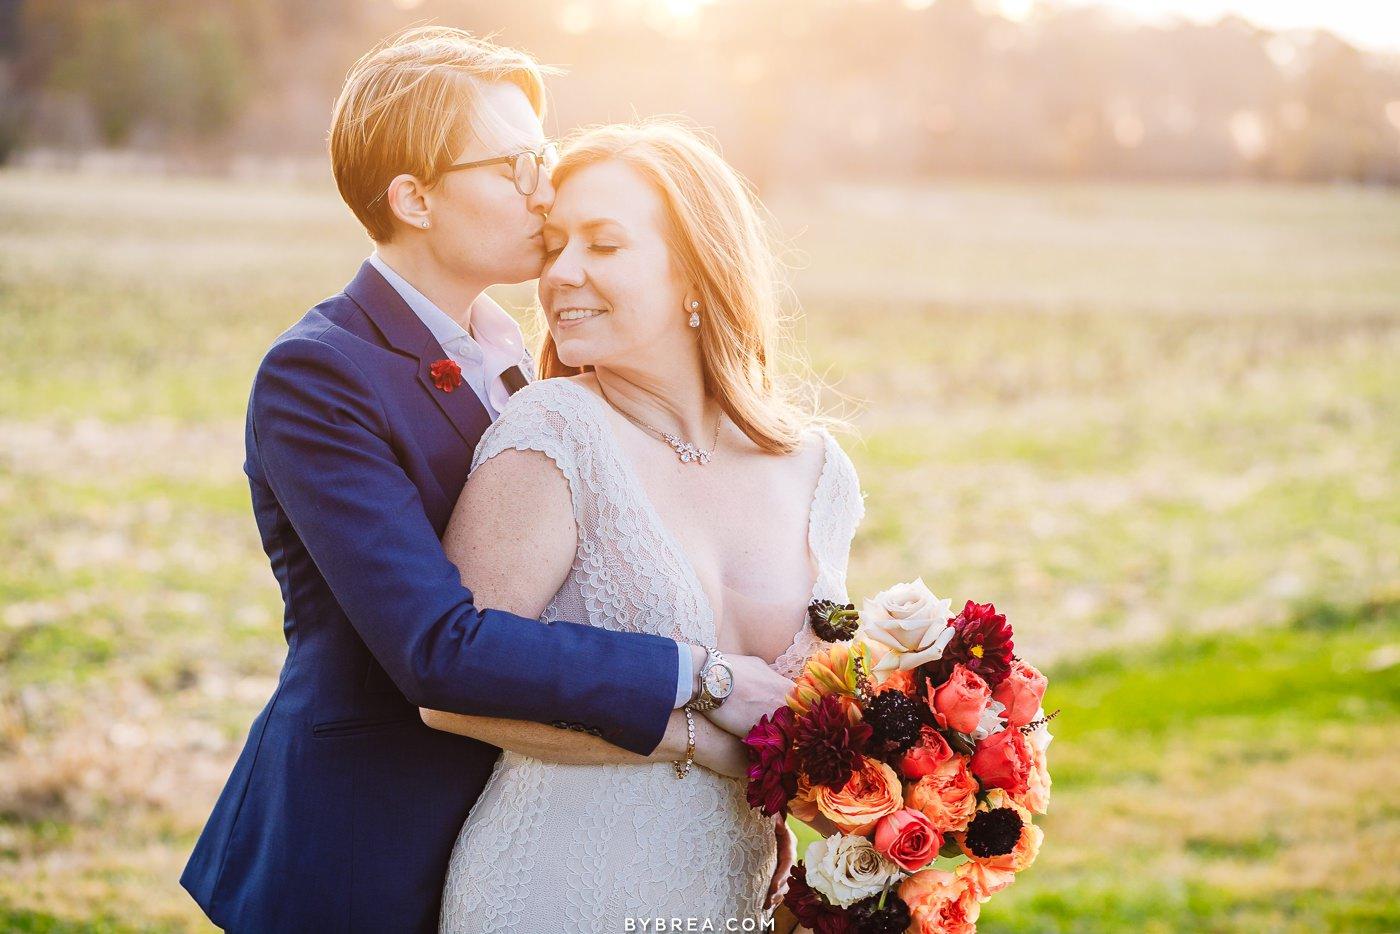 Tusculum Farm wedding portrait during same sex wedding Baltimore wedding photography